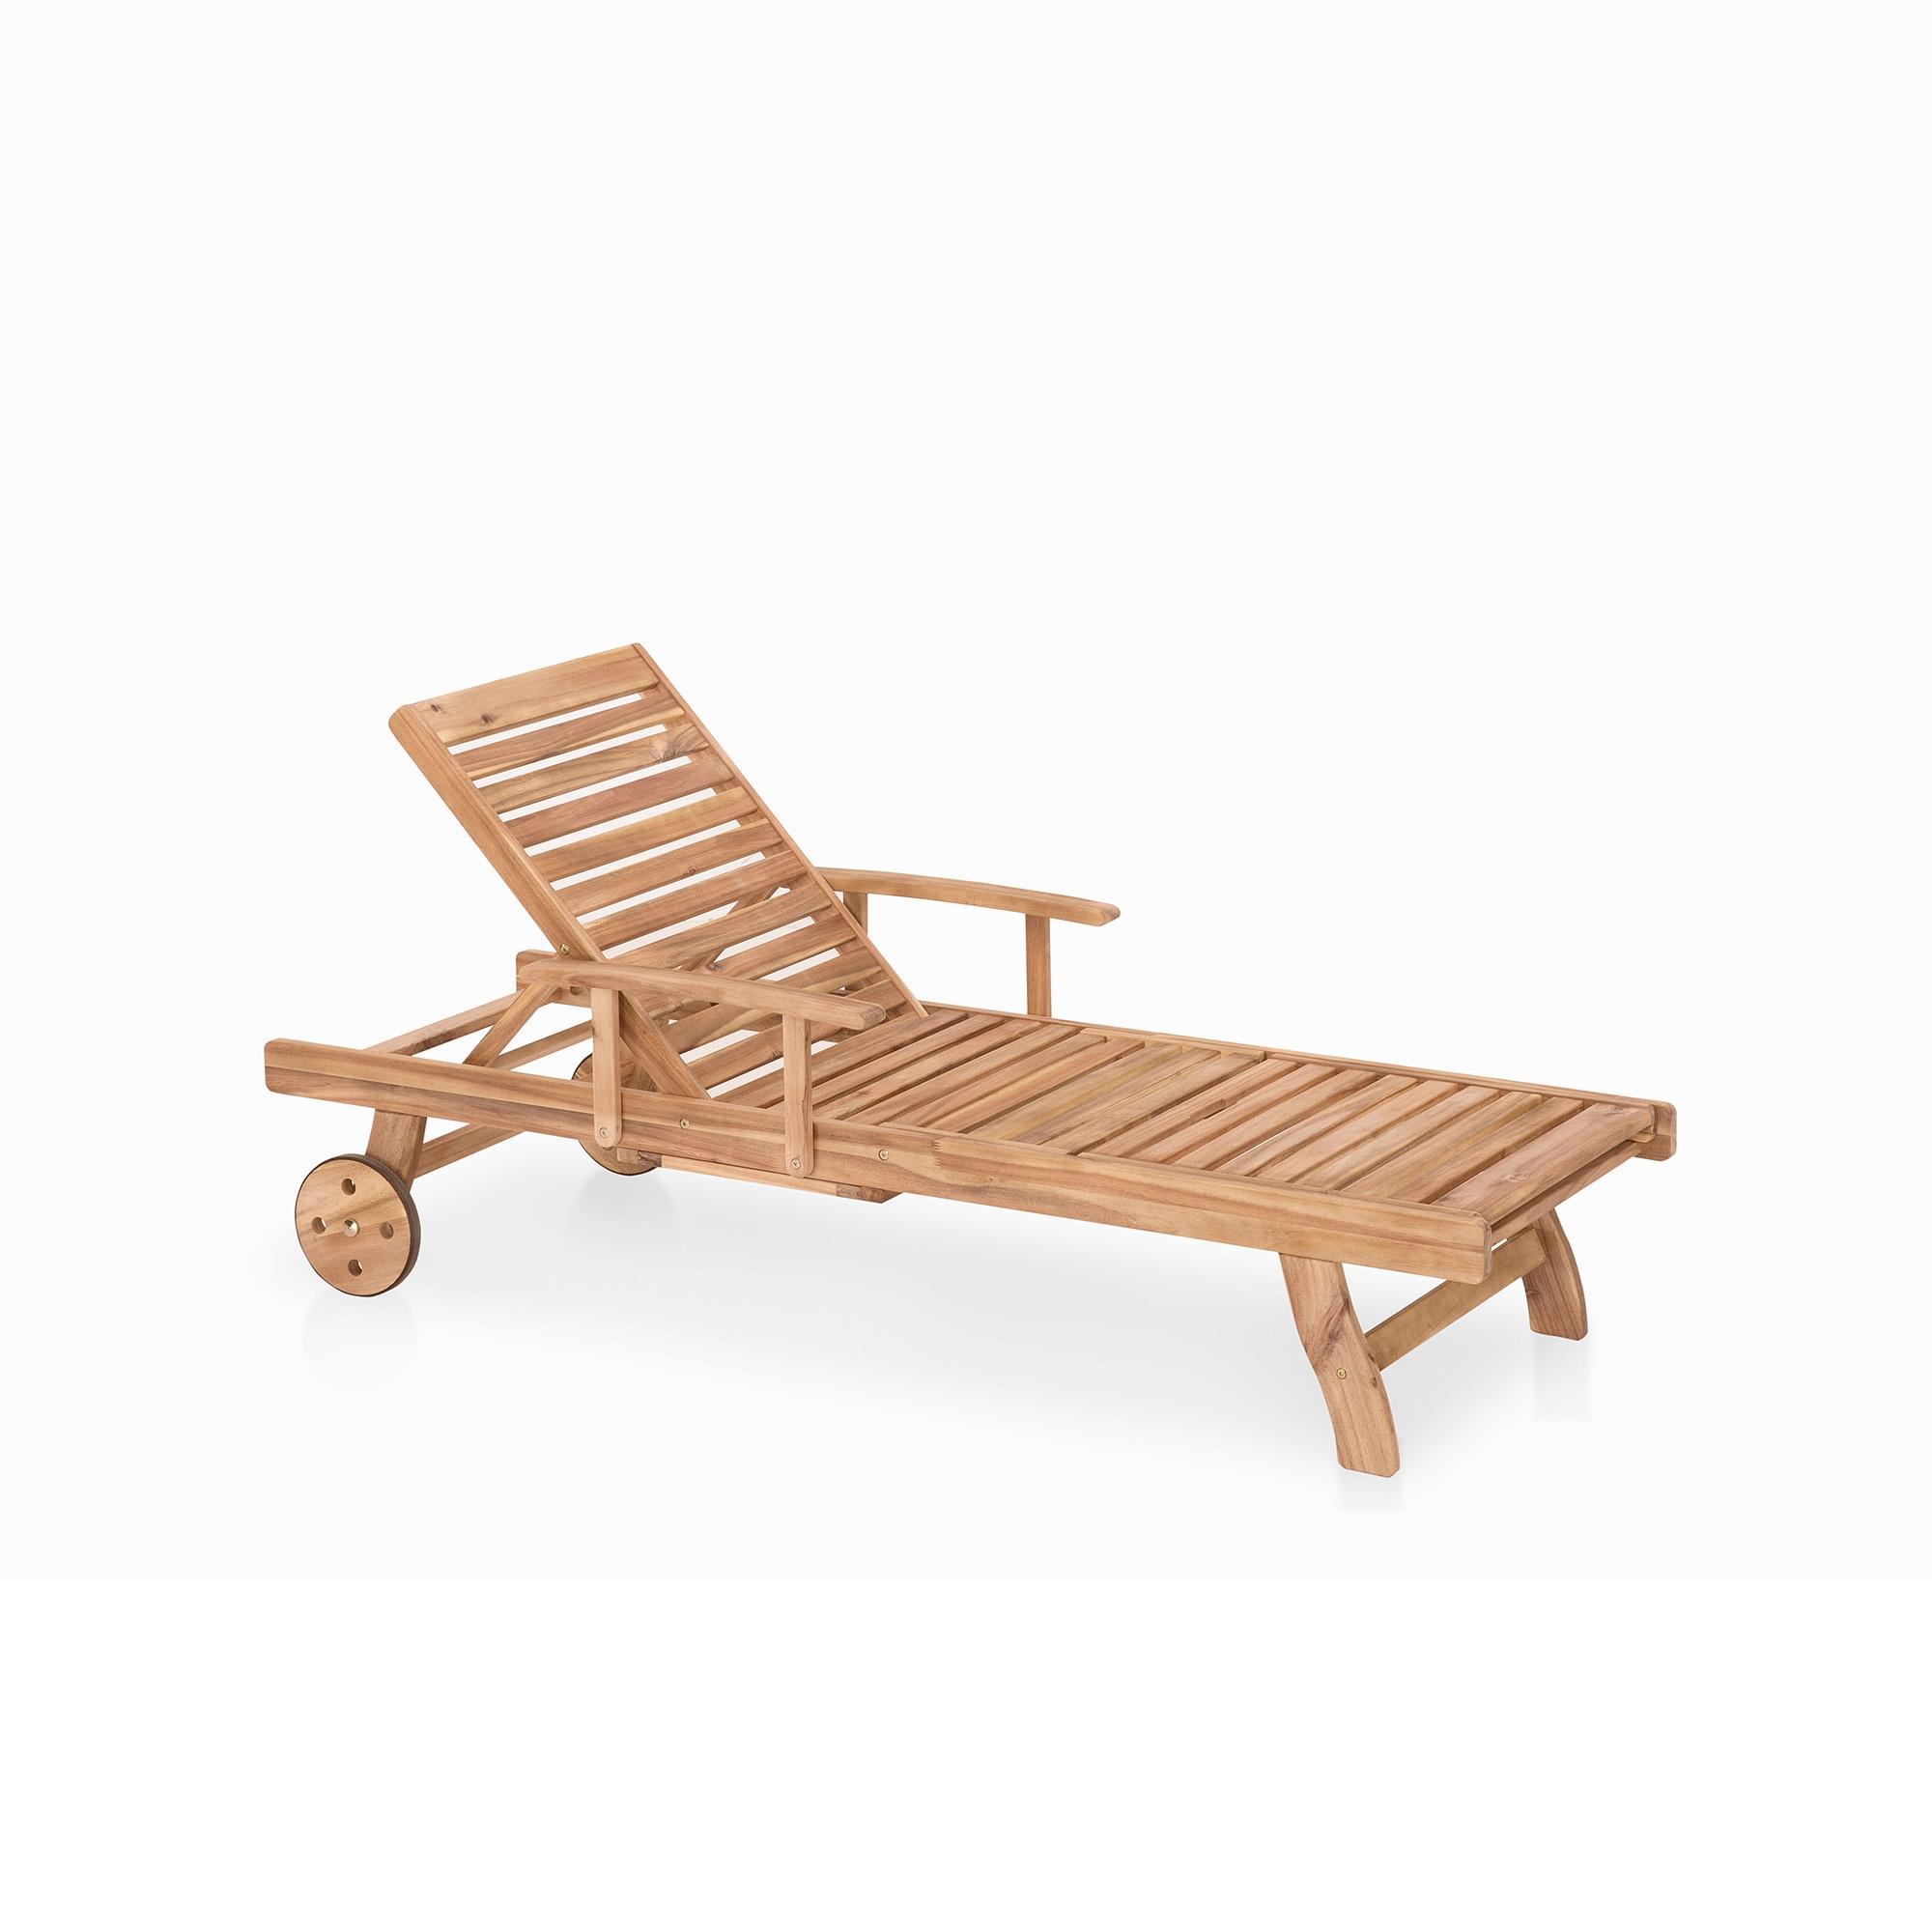 Meubles en bois teck chaise longue de jardin beliani - Chaise teck jardin ...